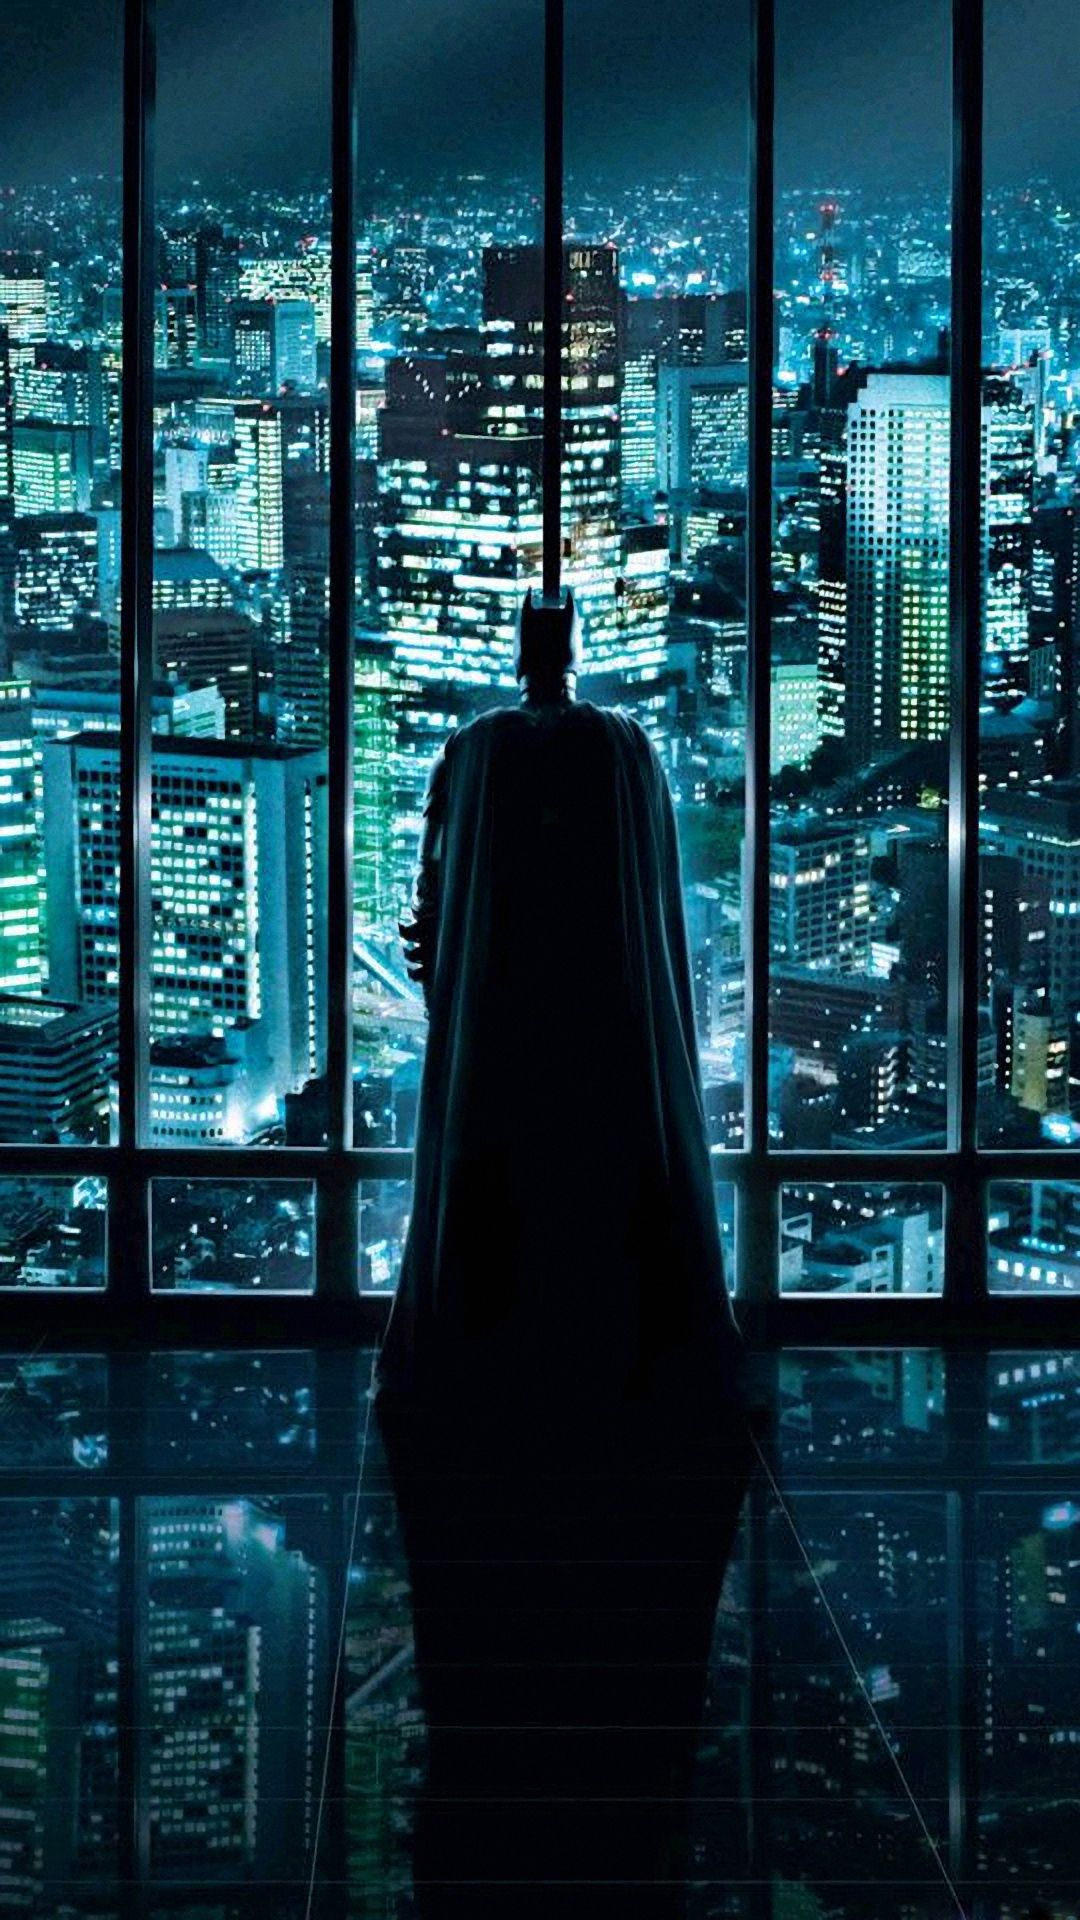 Batman Android Wallpapers - Wallpaper Cave